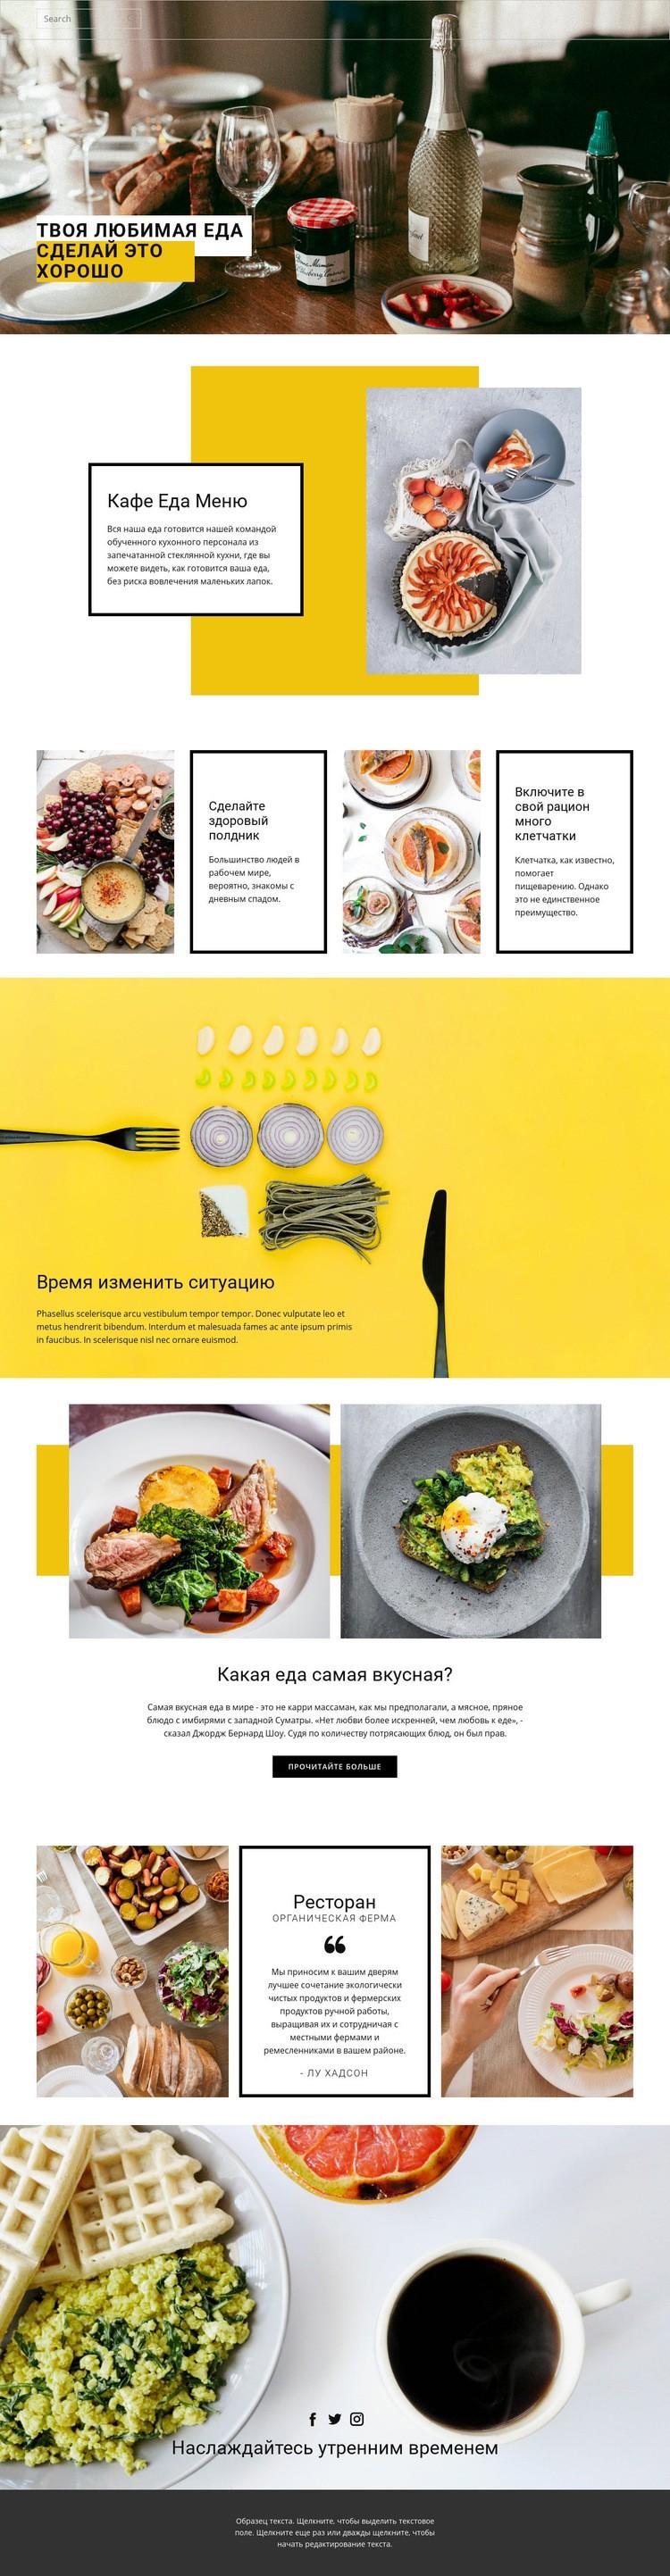 Готовьте свою любимую еду HTML шаблон